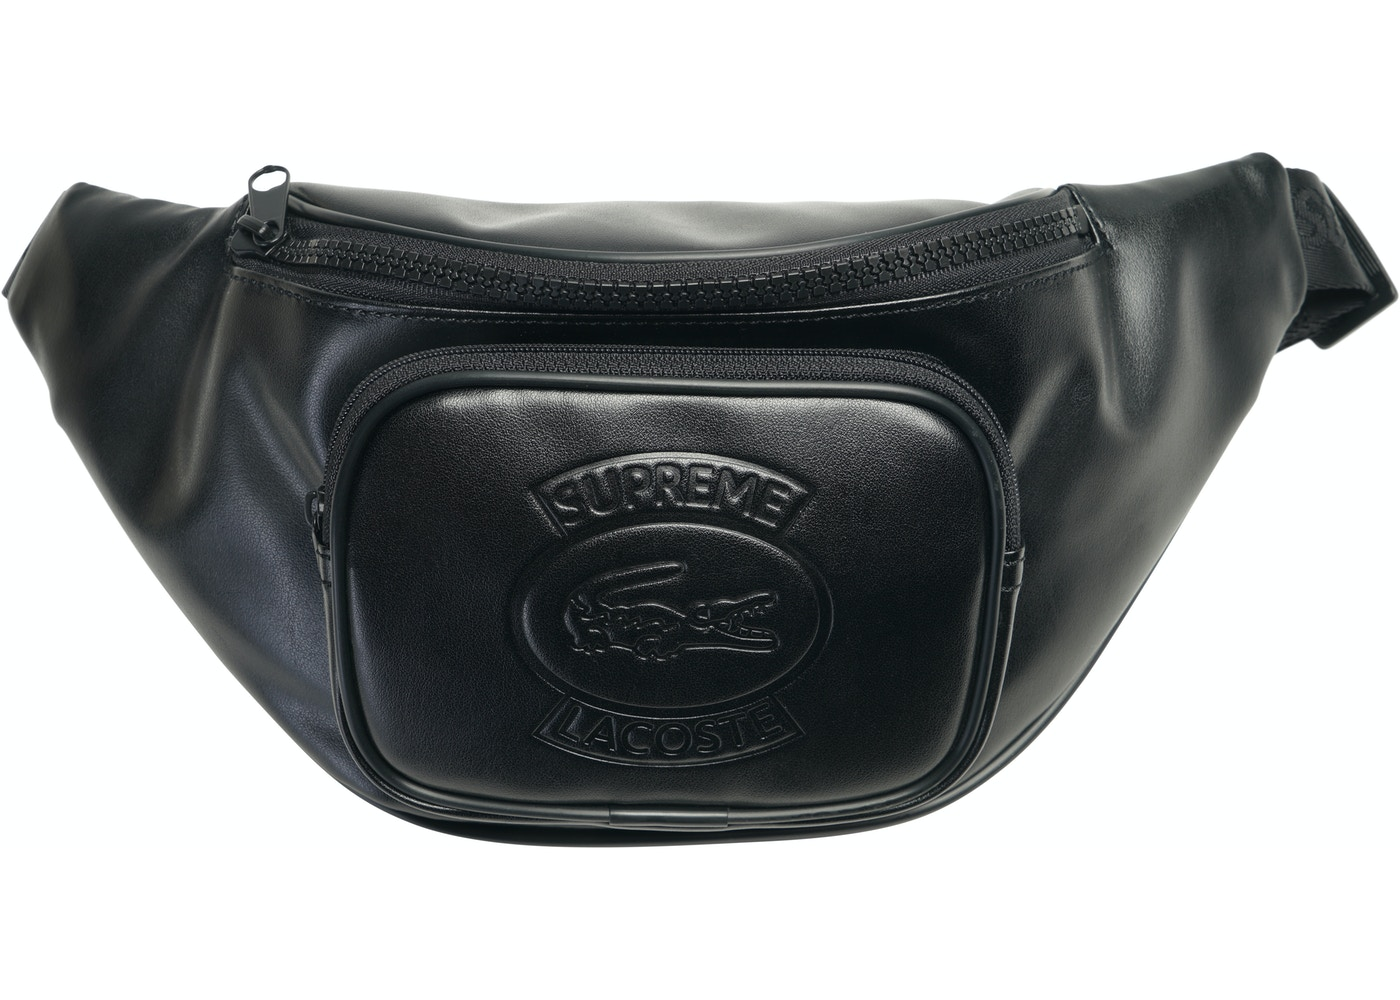 e51d2f732e28 Sell. or Ask. View All Bids. Supreme LACOSTE Waist Bag Black